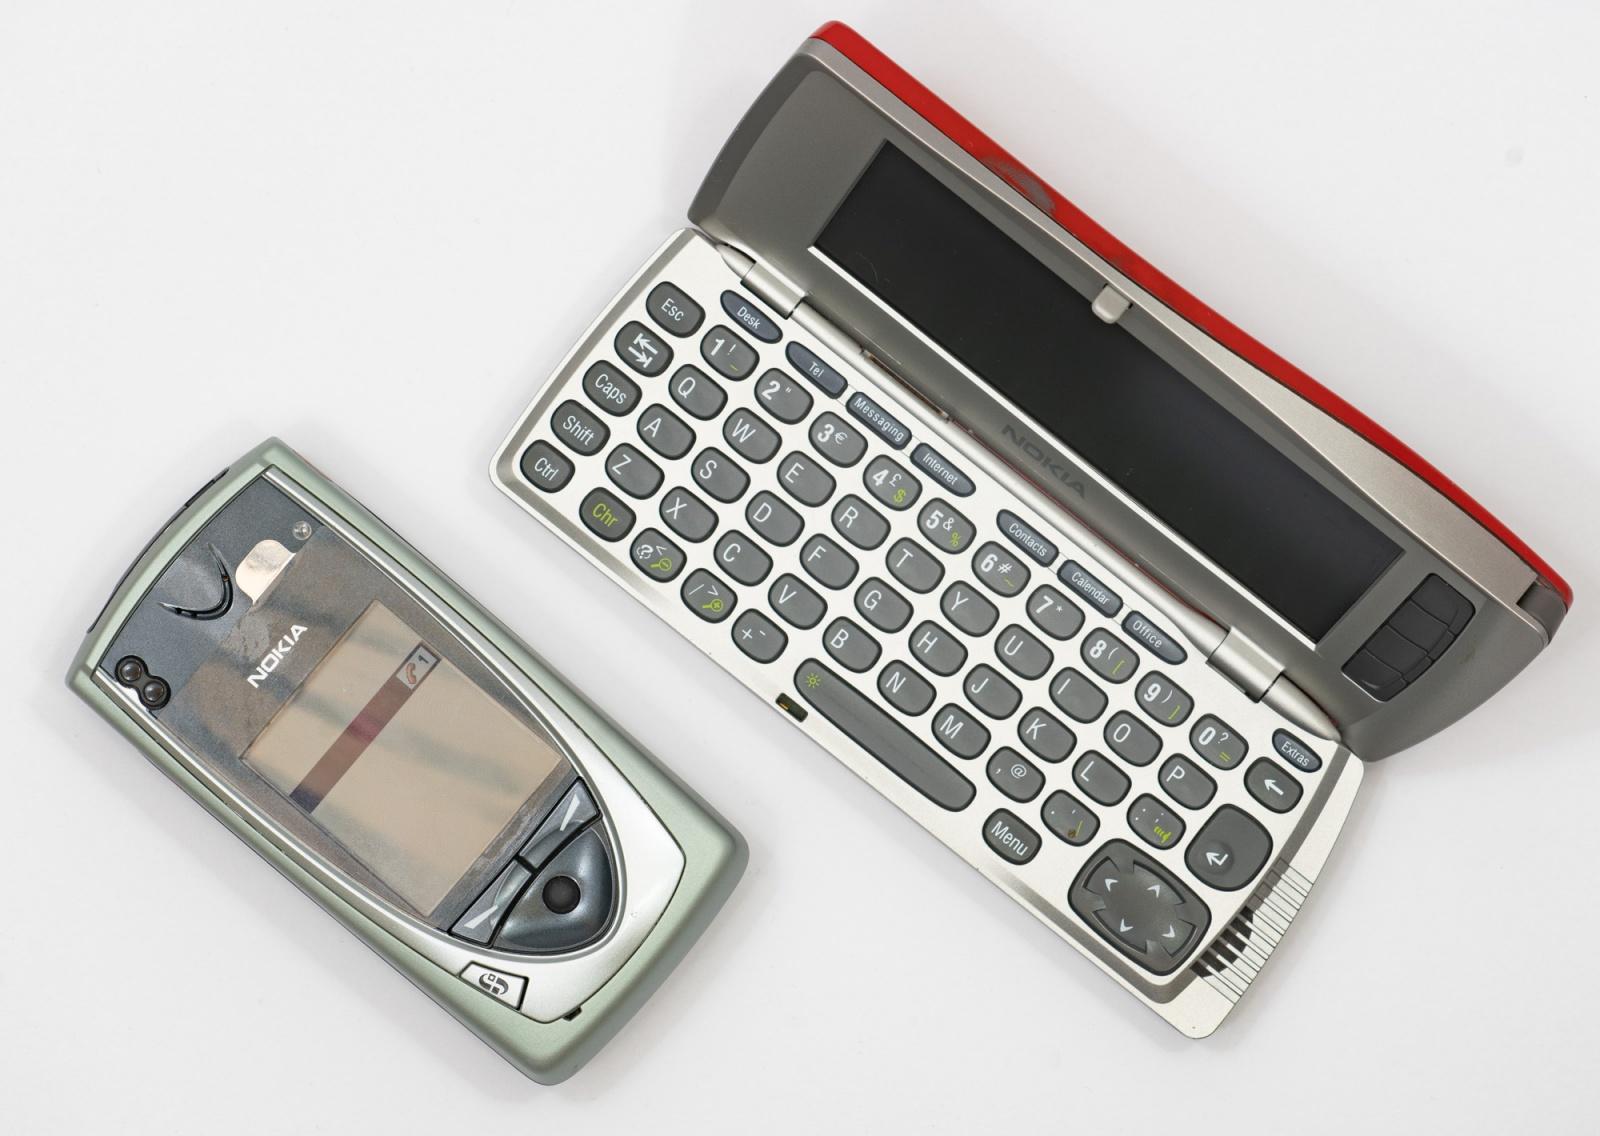 Nokia 7650 и начало эпохи смартфонов - 2